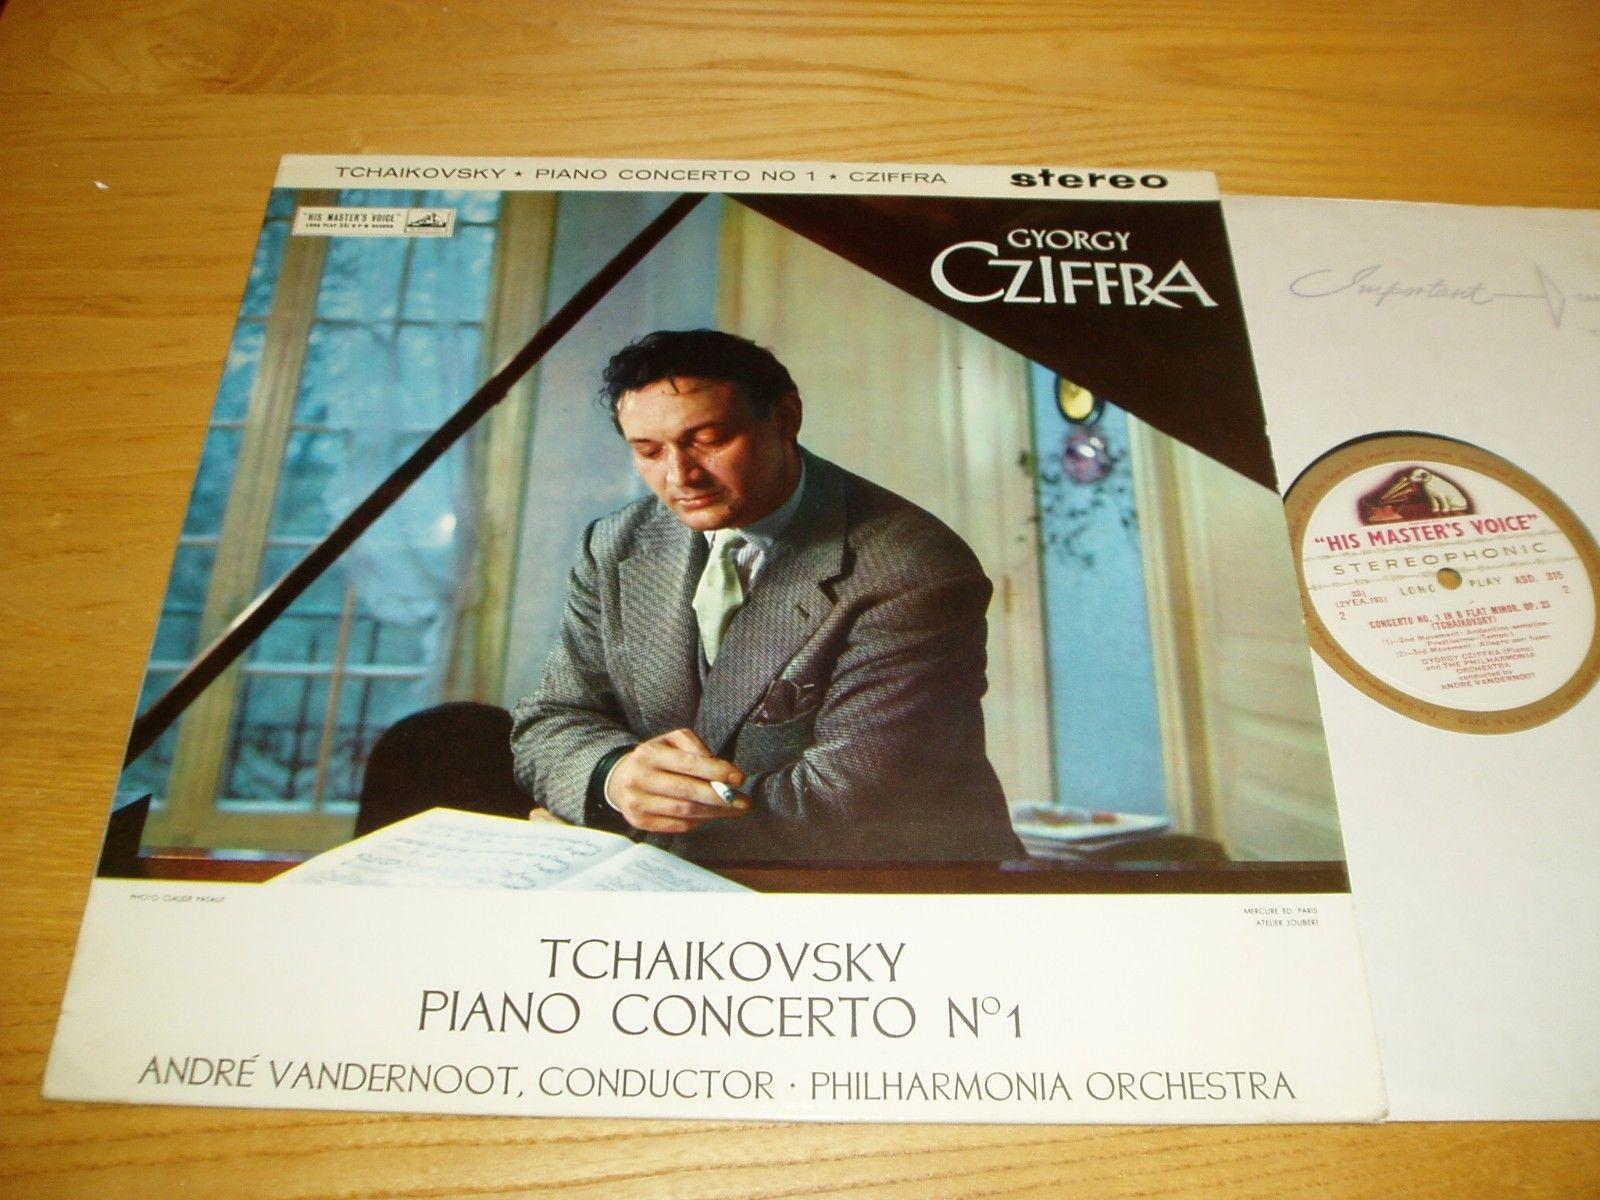 HMV ASD 315 UK 1st C/G TCHAIKOVSKY - PIANO CONCERTO NO. 1 *GYORGY CZIFFRA* EX+